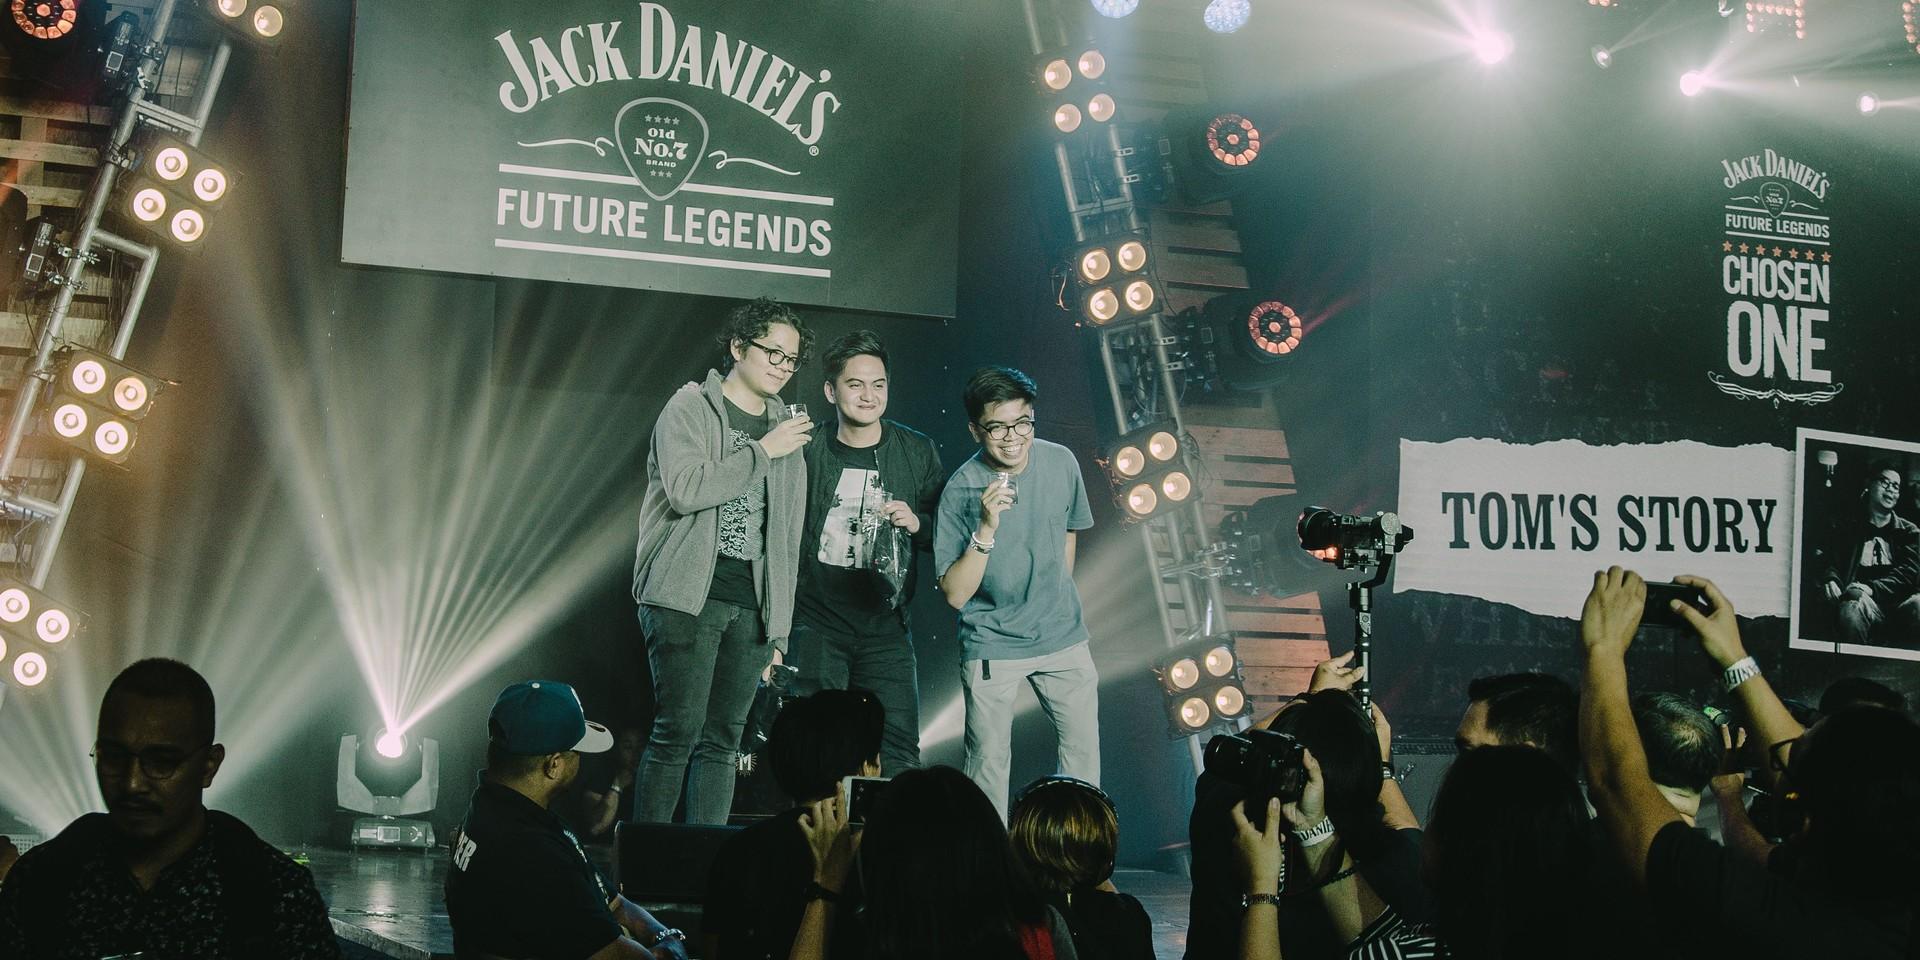 Tom's Story is Jack Daniel's Future Legends Chosen One